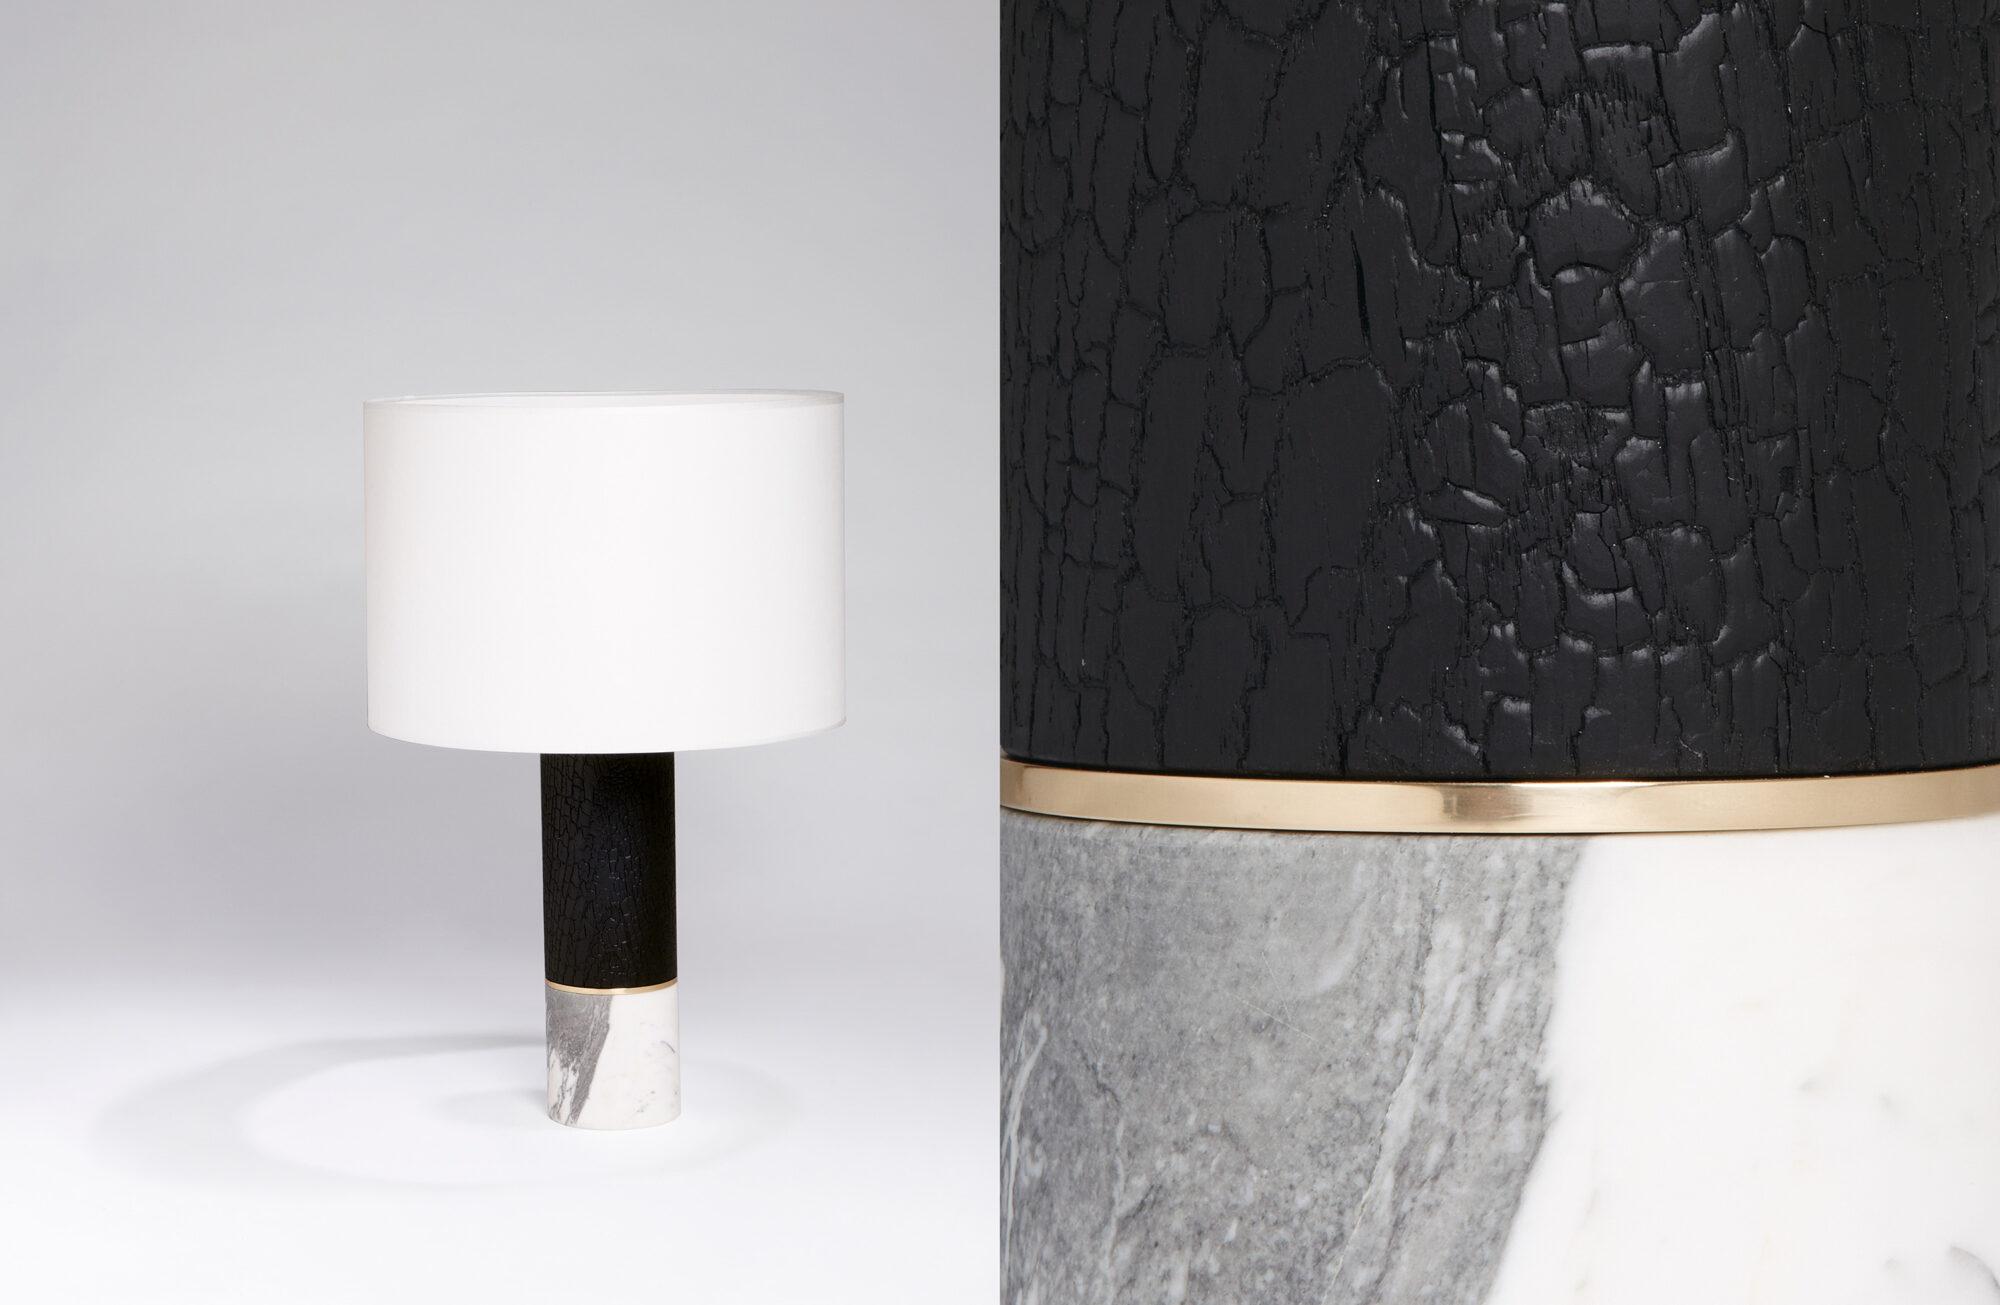 Materials revealed & a tribute to Brancusi - Galerie Negropontes